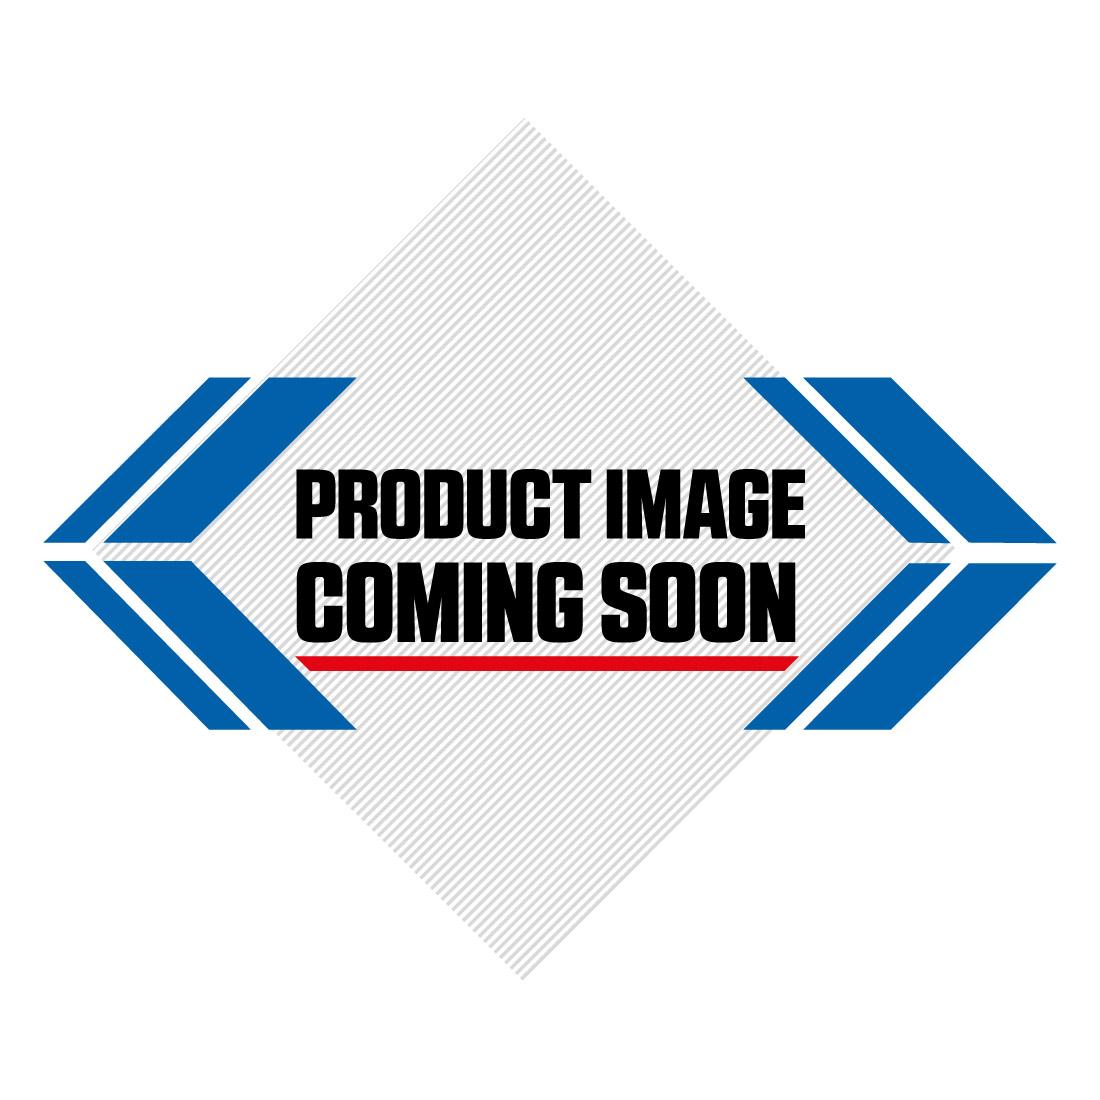 Silkolene Comp 4 10w-40 XP Ester Based Semi Synthetic Bike Engine Oil - 4 Cube Image-1>